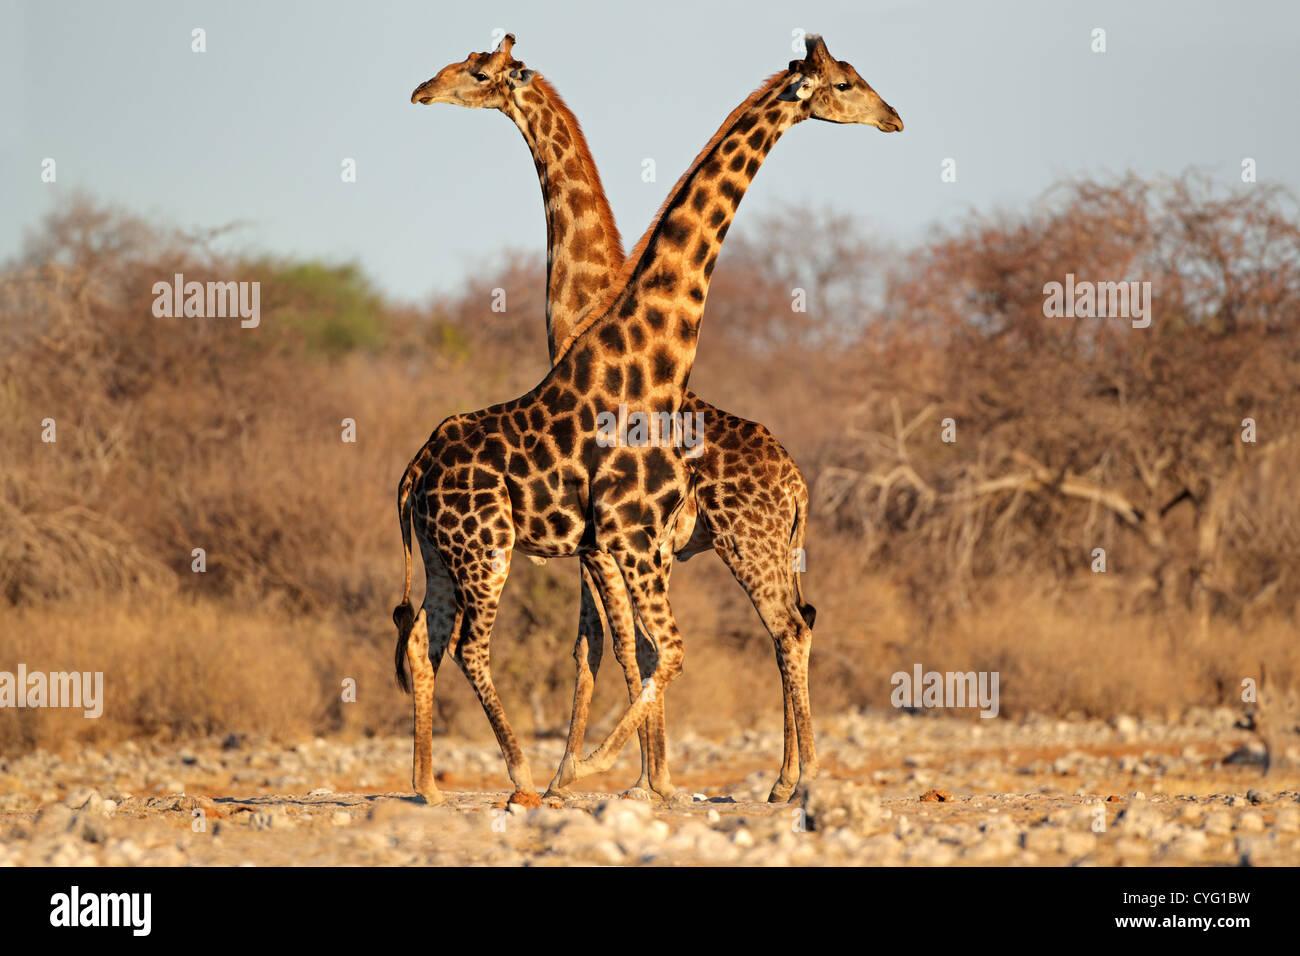 Deux taureaux Girafe (Giraffa camelopardalis), Etosha National Park, Namibie, Afrique du Sud Banque D'Images